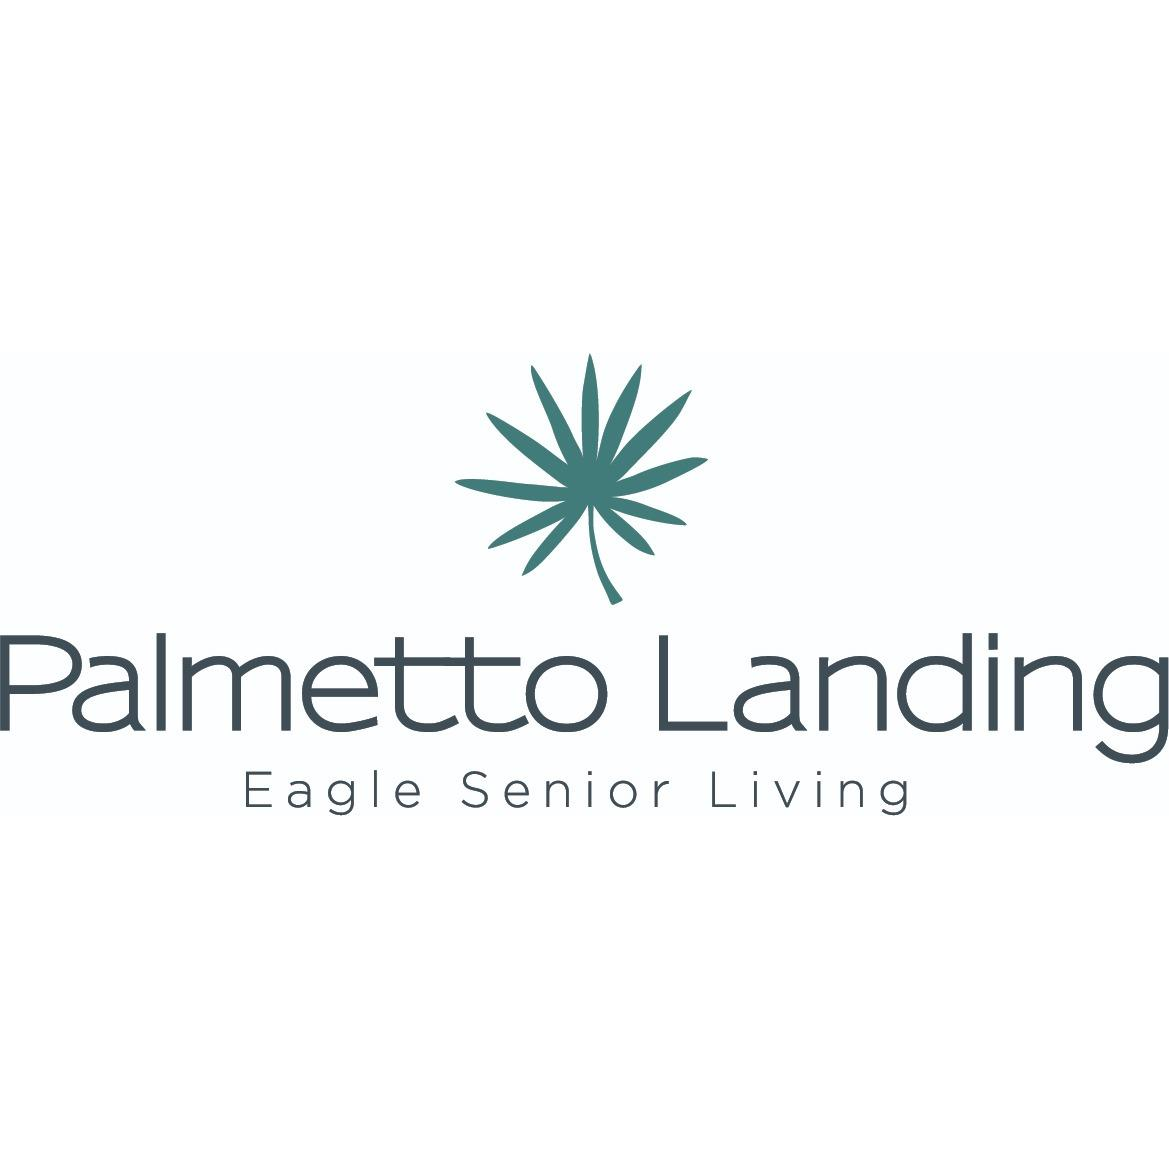 Palmetto Landing